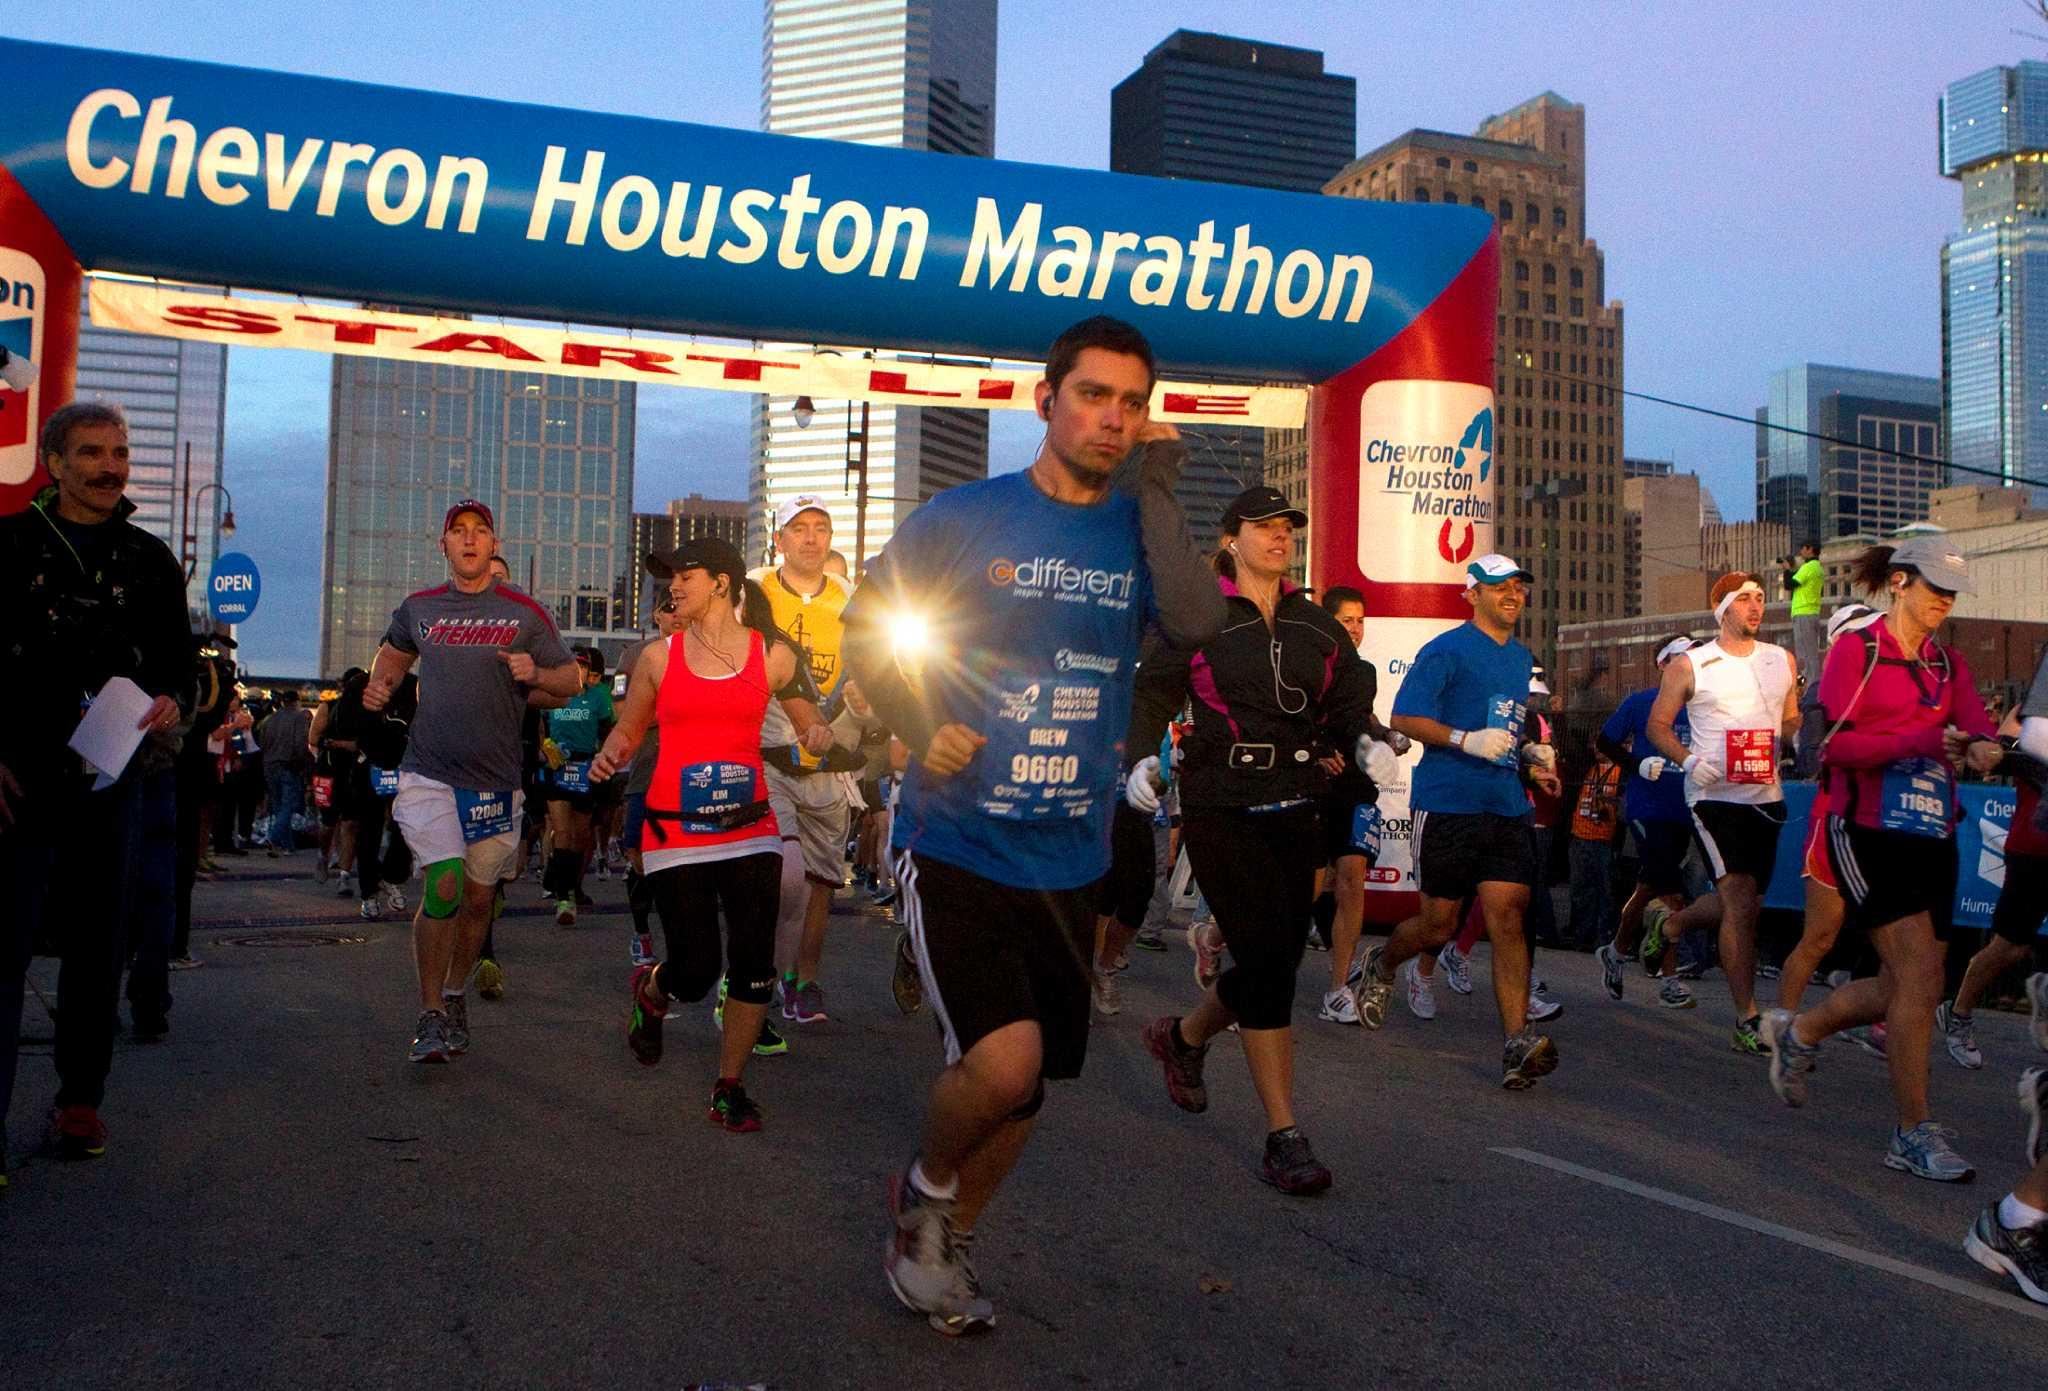 houston chevron marathon 2020